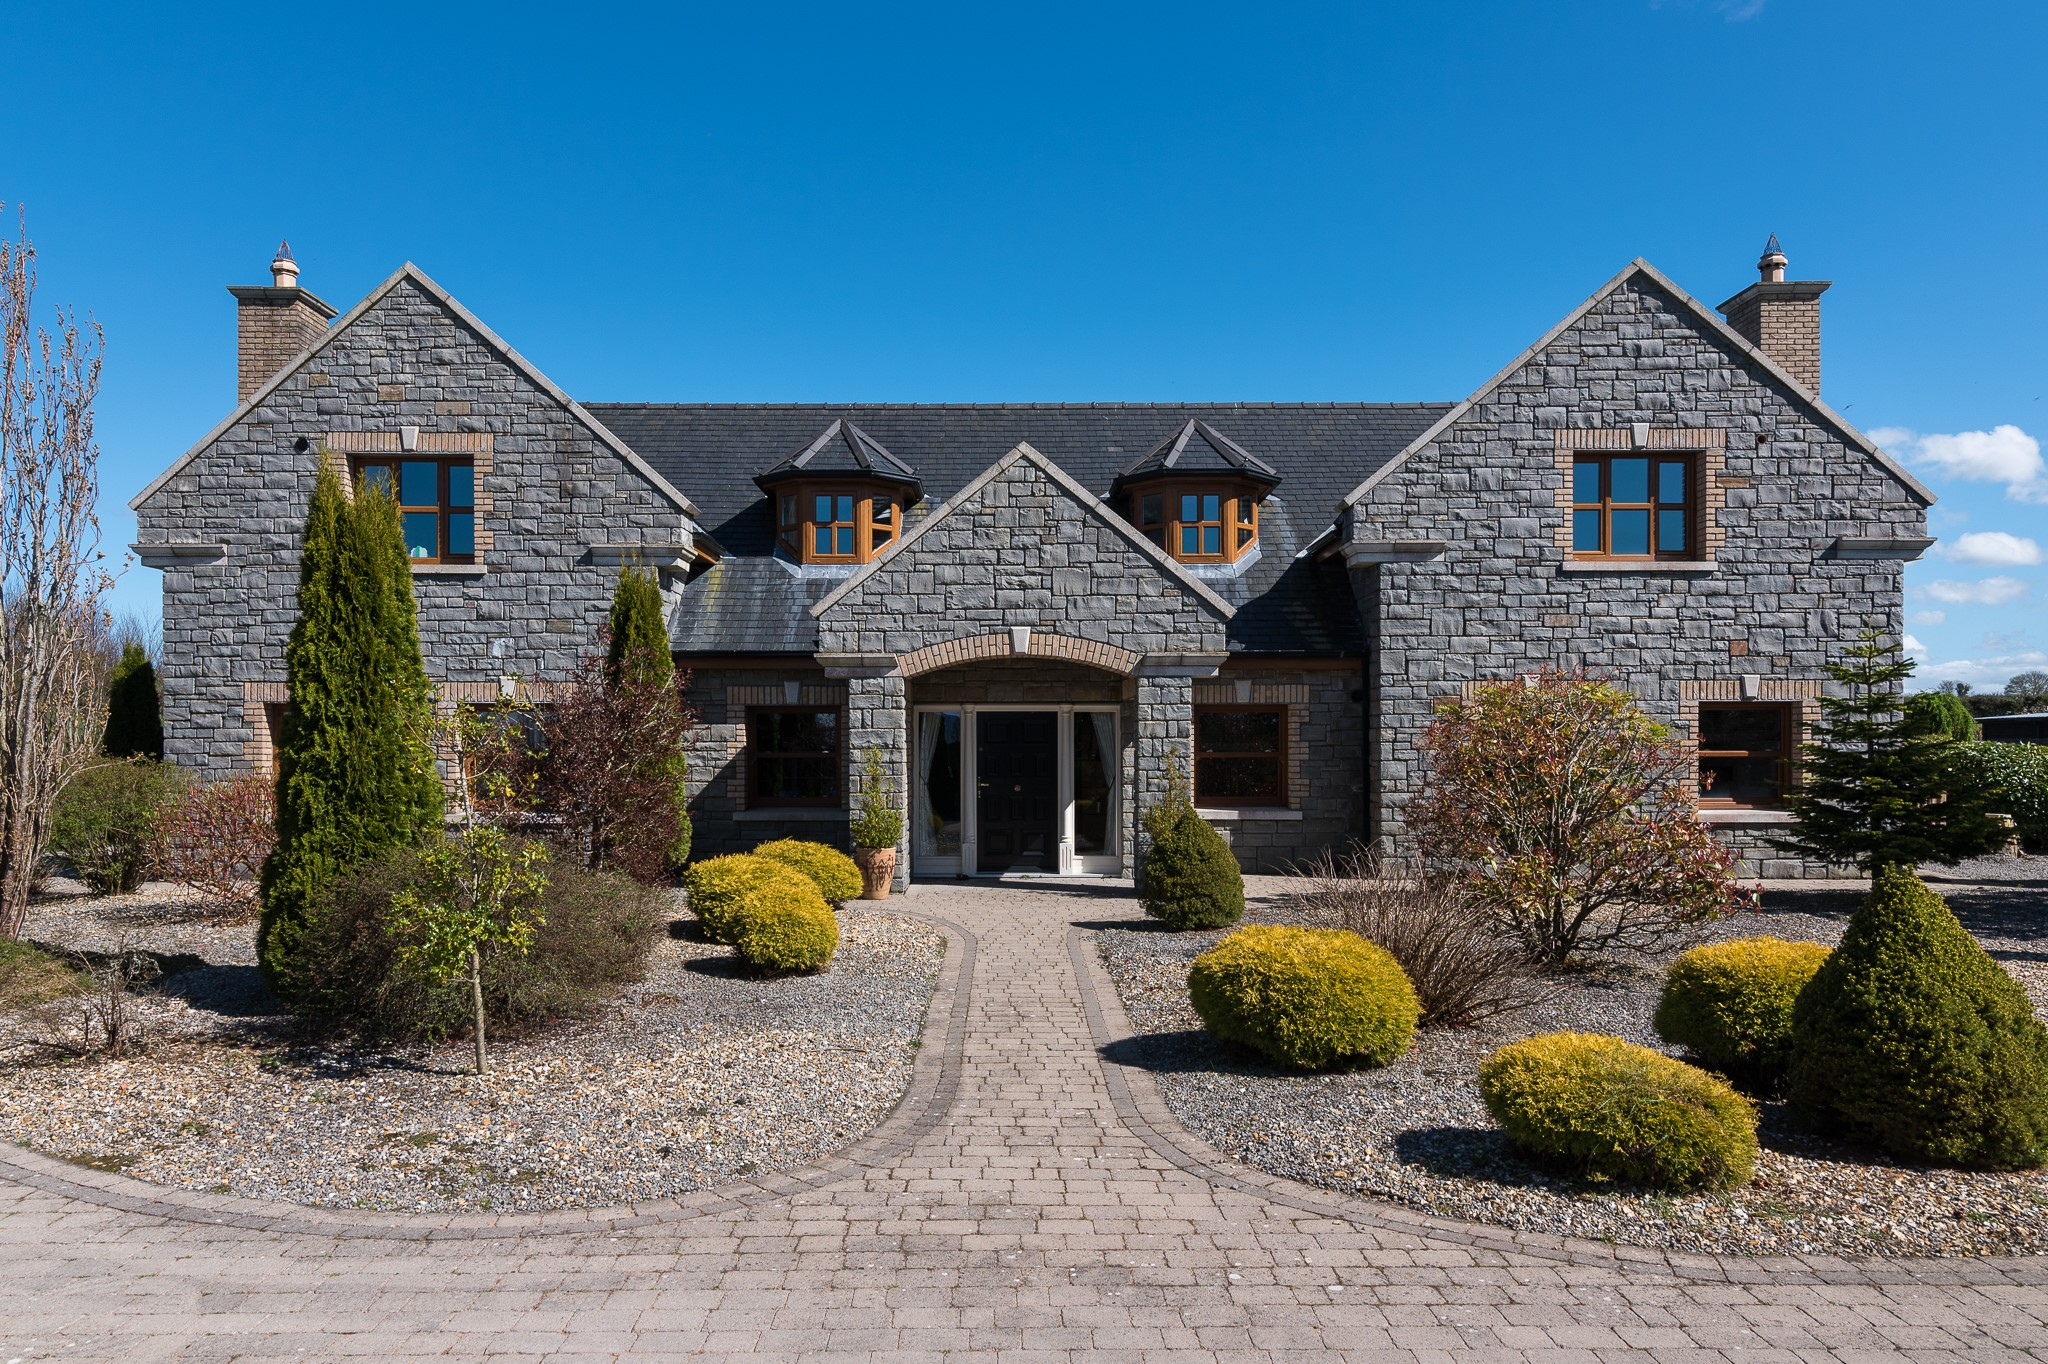 Carrick Finn Lodge, Glasson, Athlone, Co. Westmeath